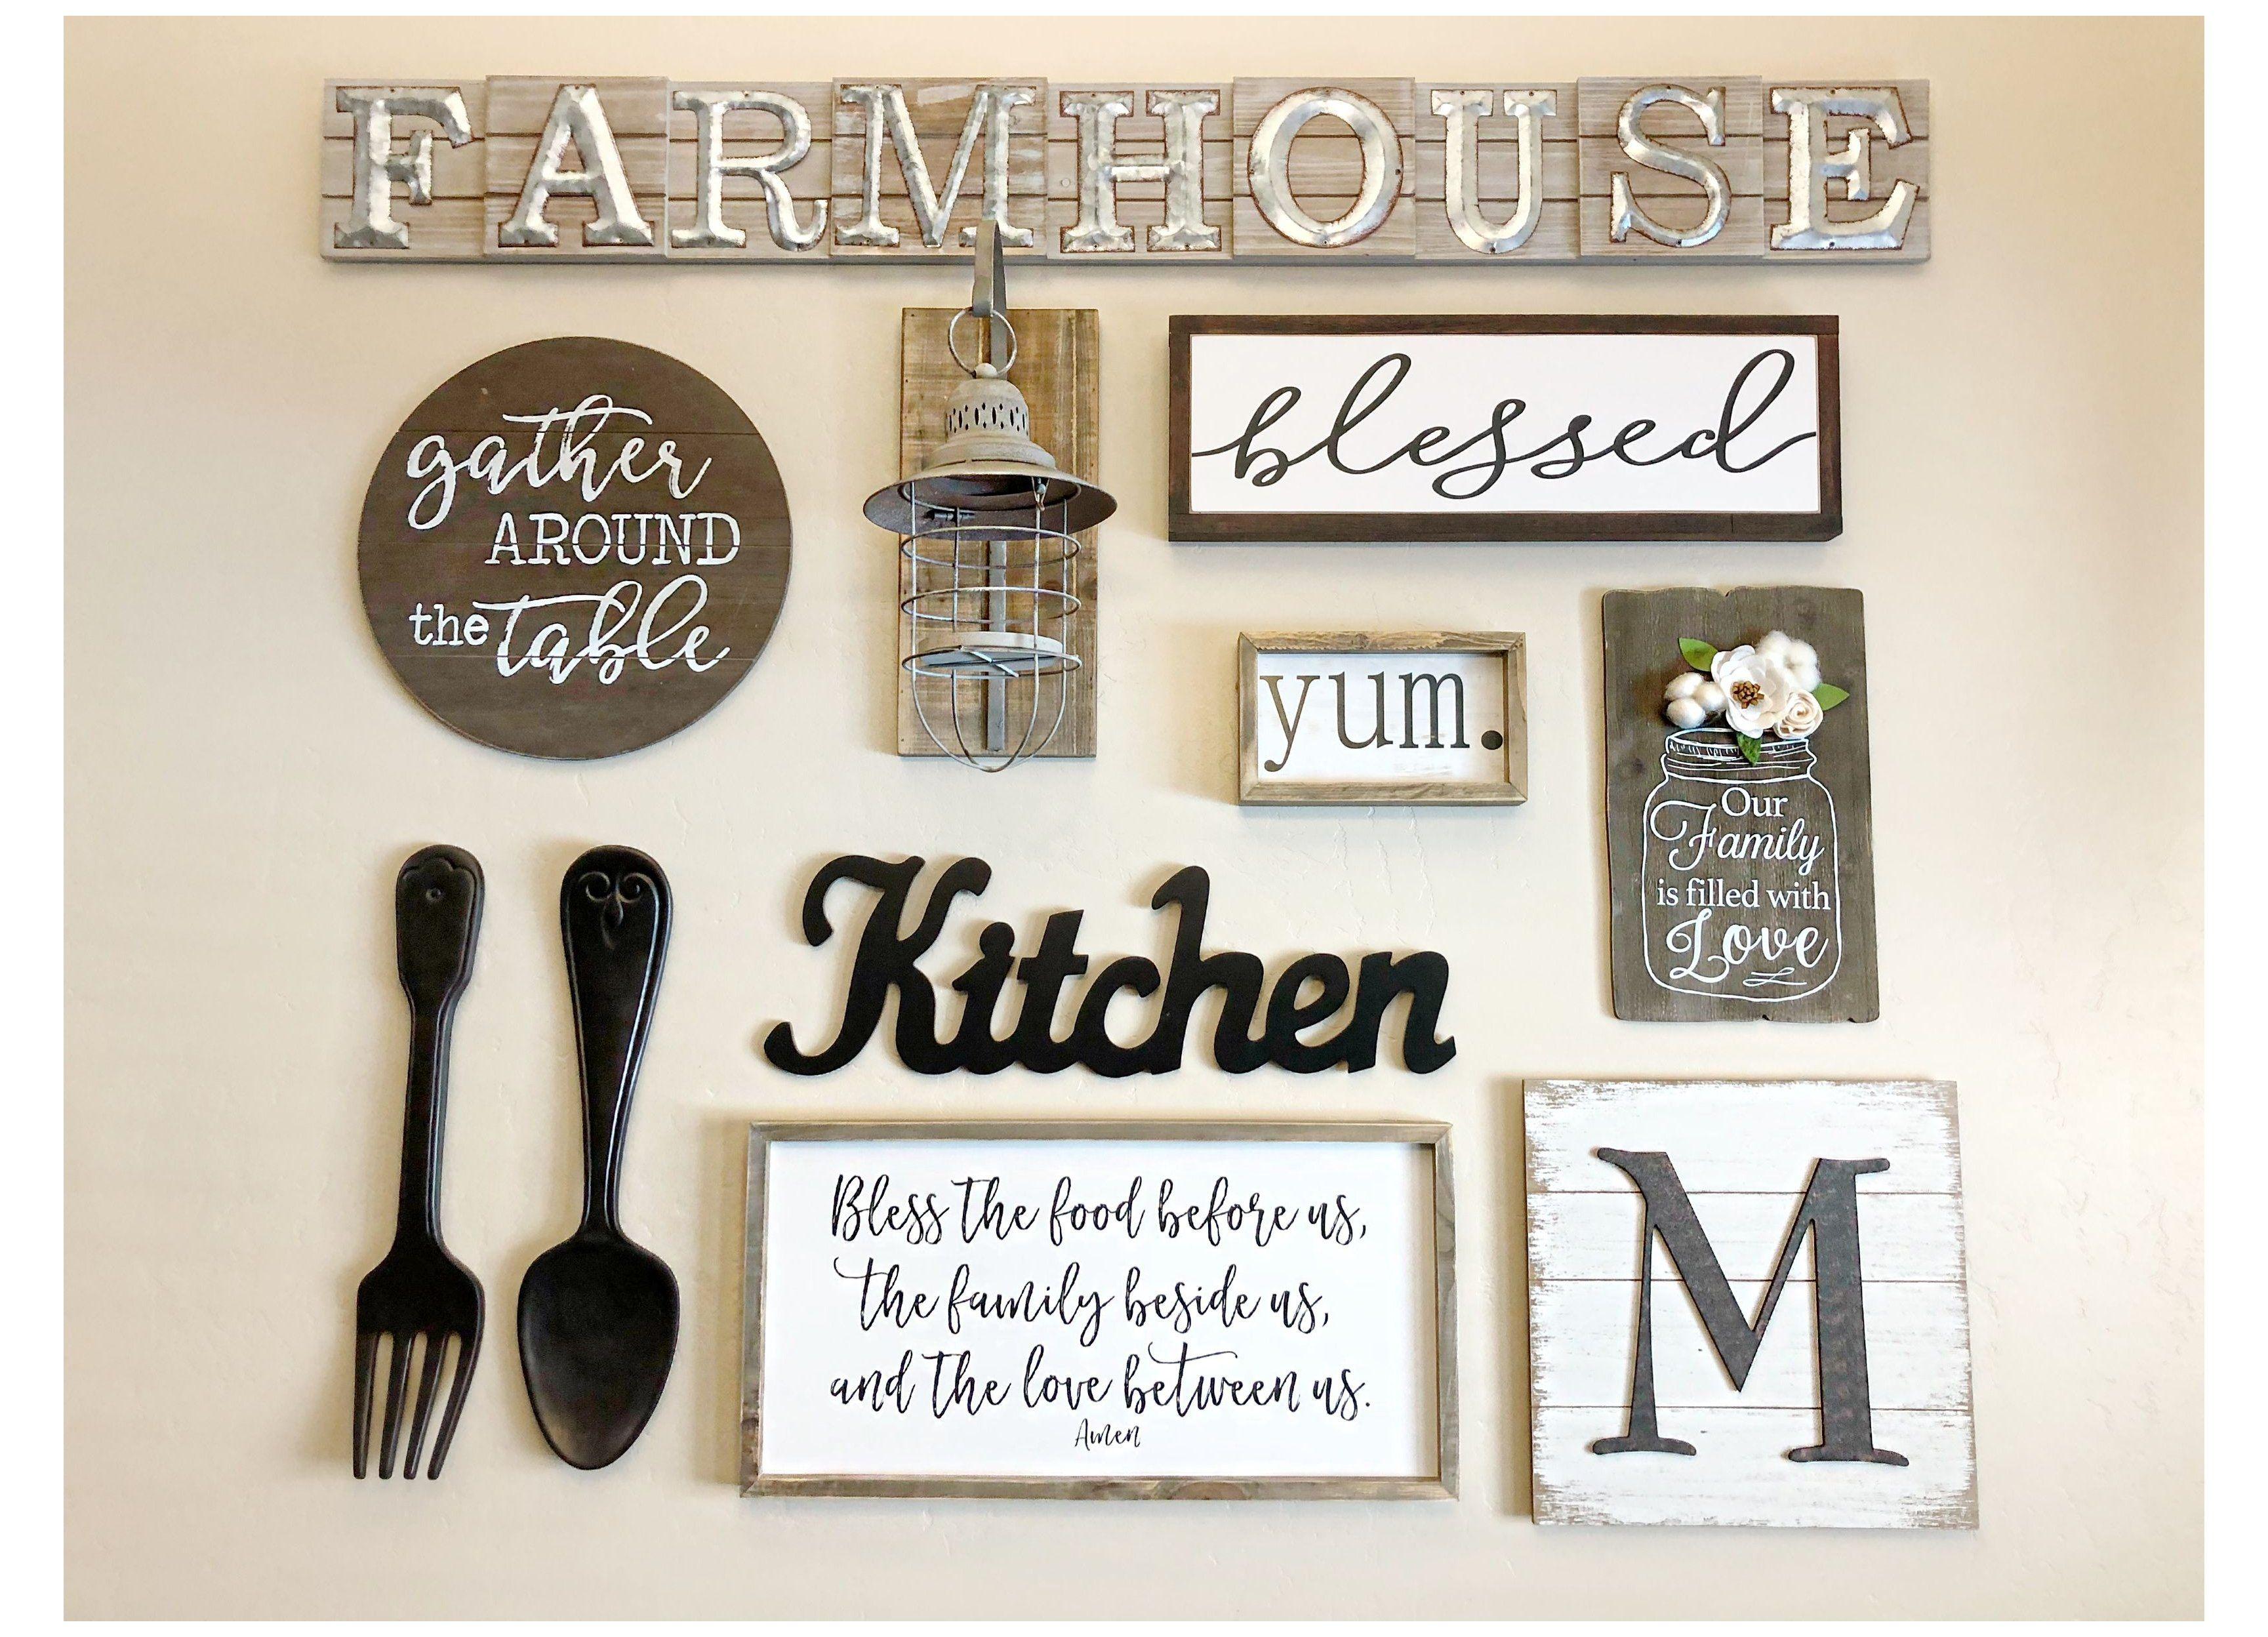 Farm Kitchen Wall Decor Ideas Farmkitchenwalldecorideas In 2021 Kitchen Decor Wall Art Kitchen Gallery Wall Farm Kitchen Decor Country kitchen wall decorations